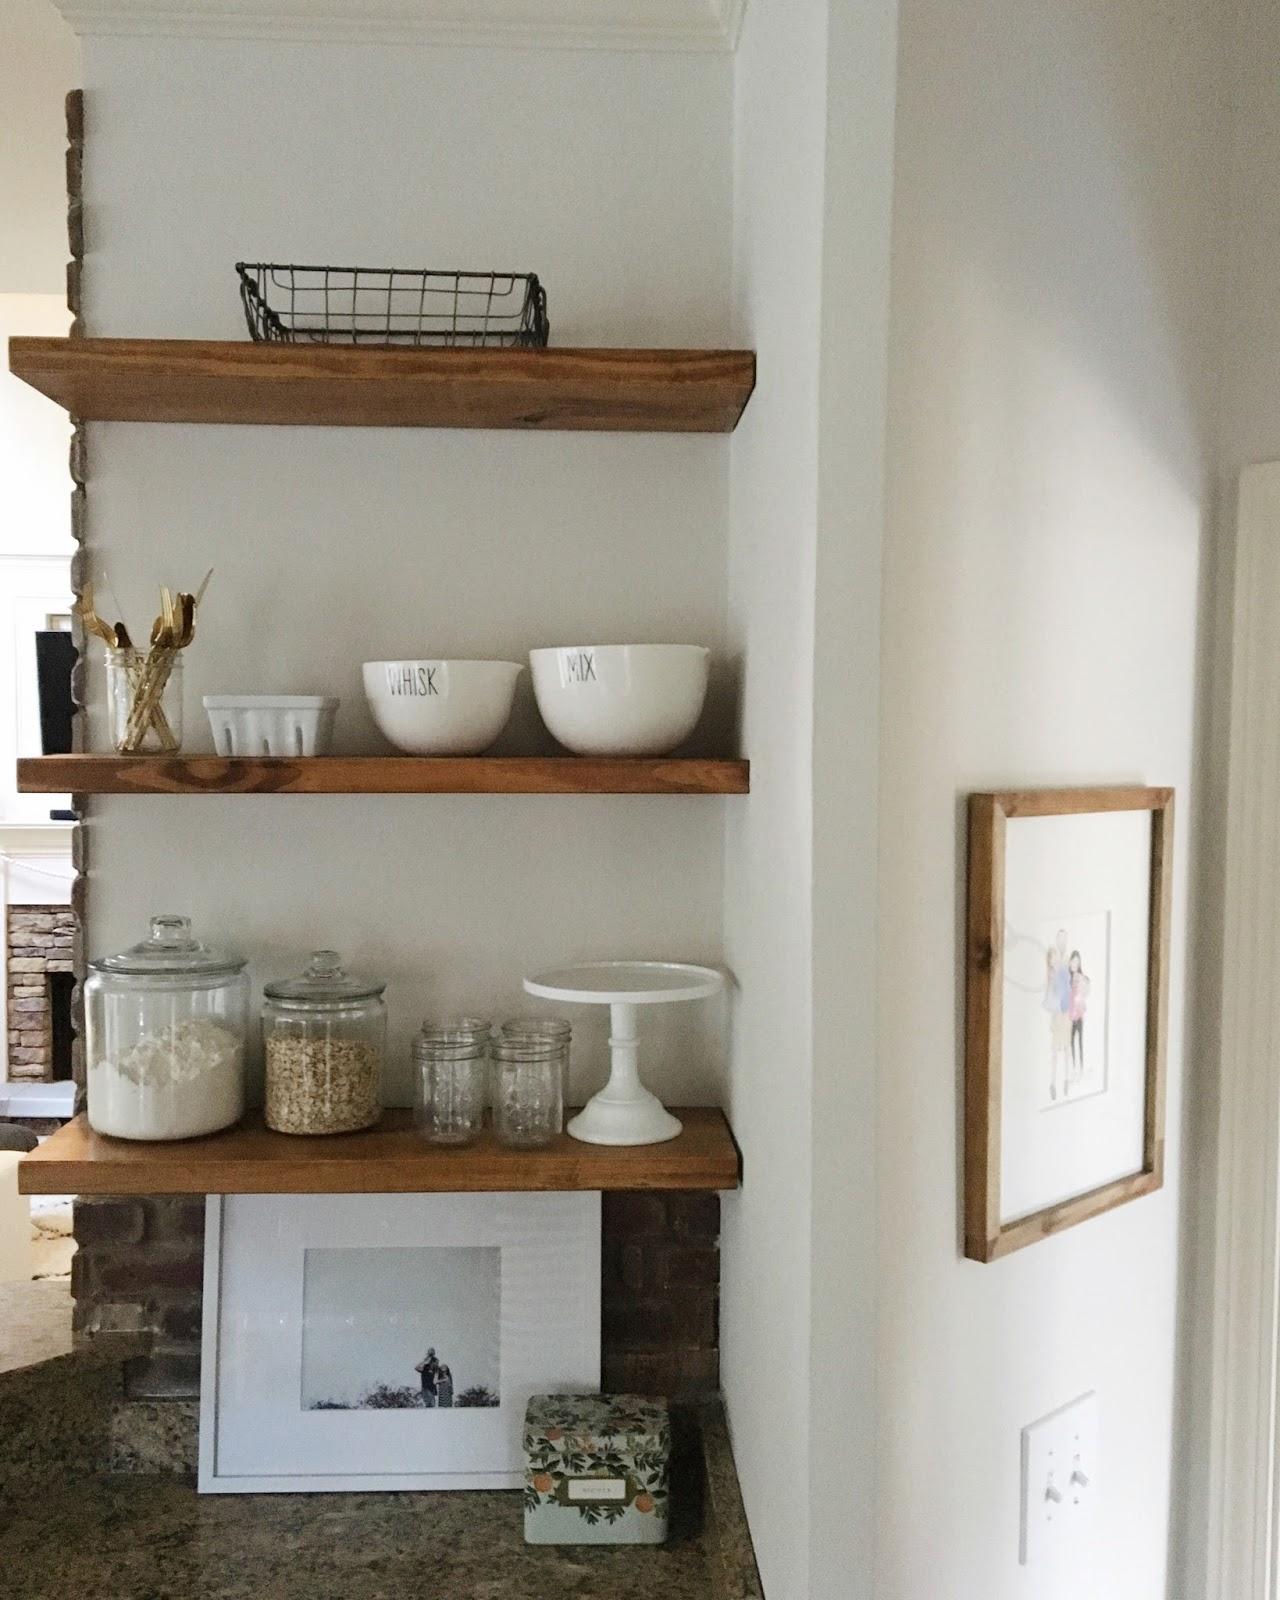 West Elm Floating Shelves diy open shelving reveal - garvinandco